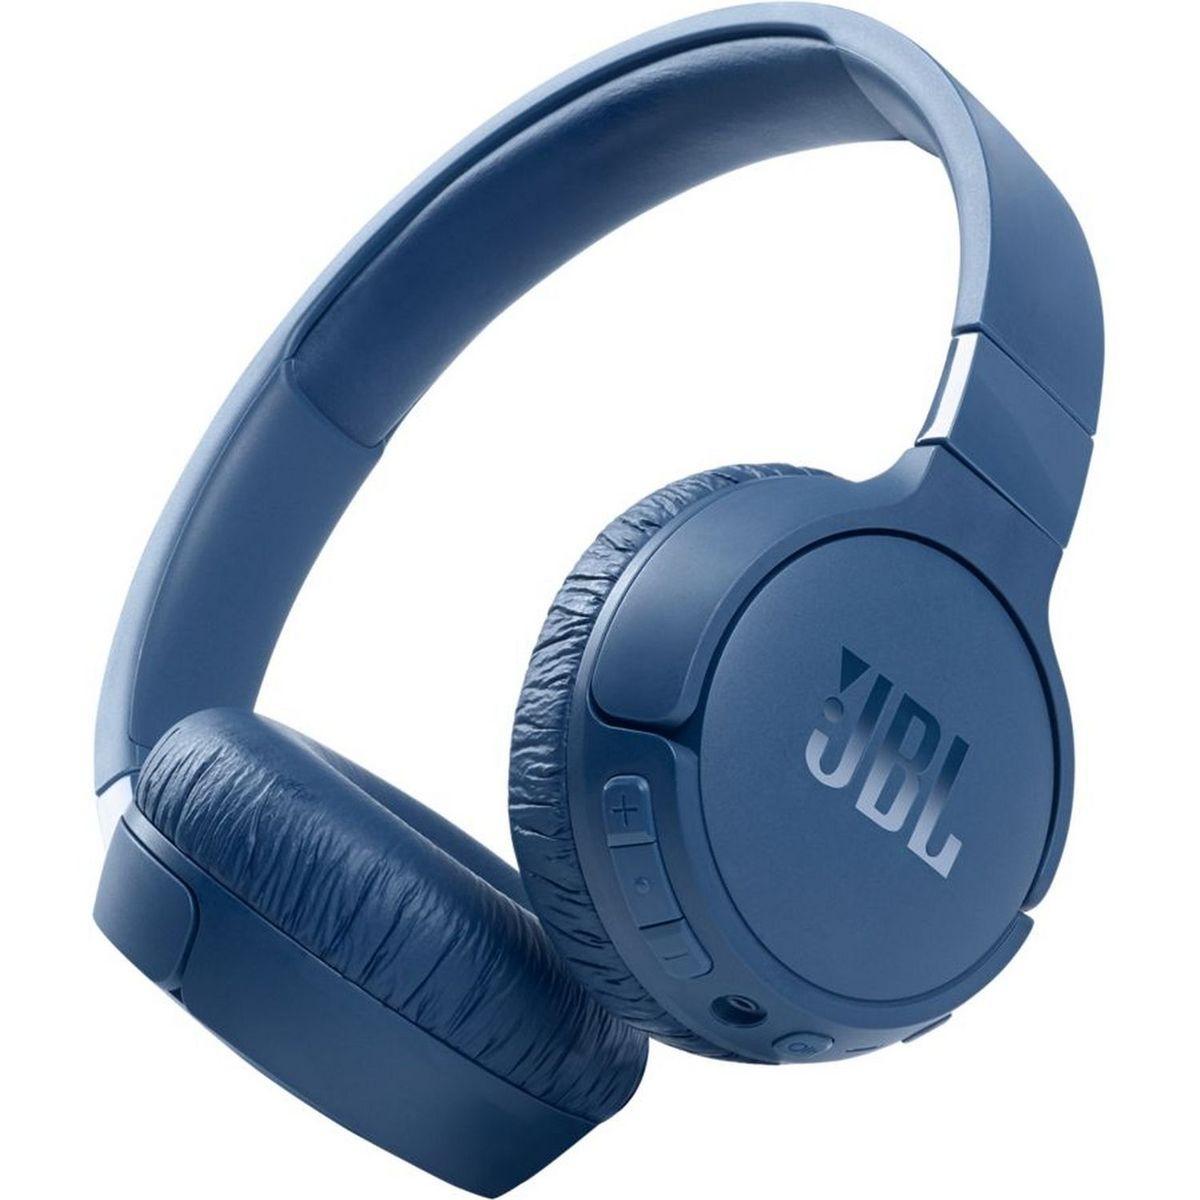 Casque audio Bluetooth - Tune 660NC - Bleu